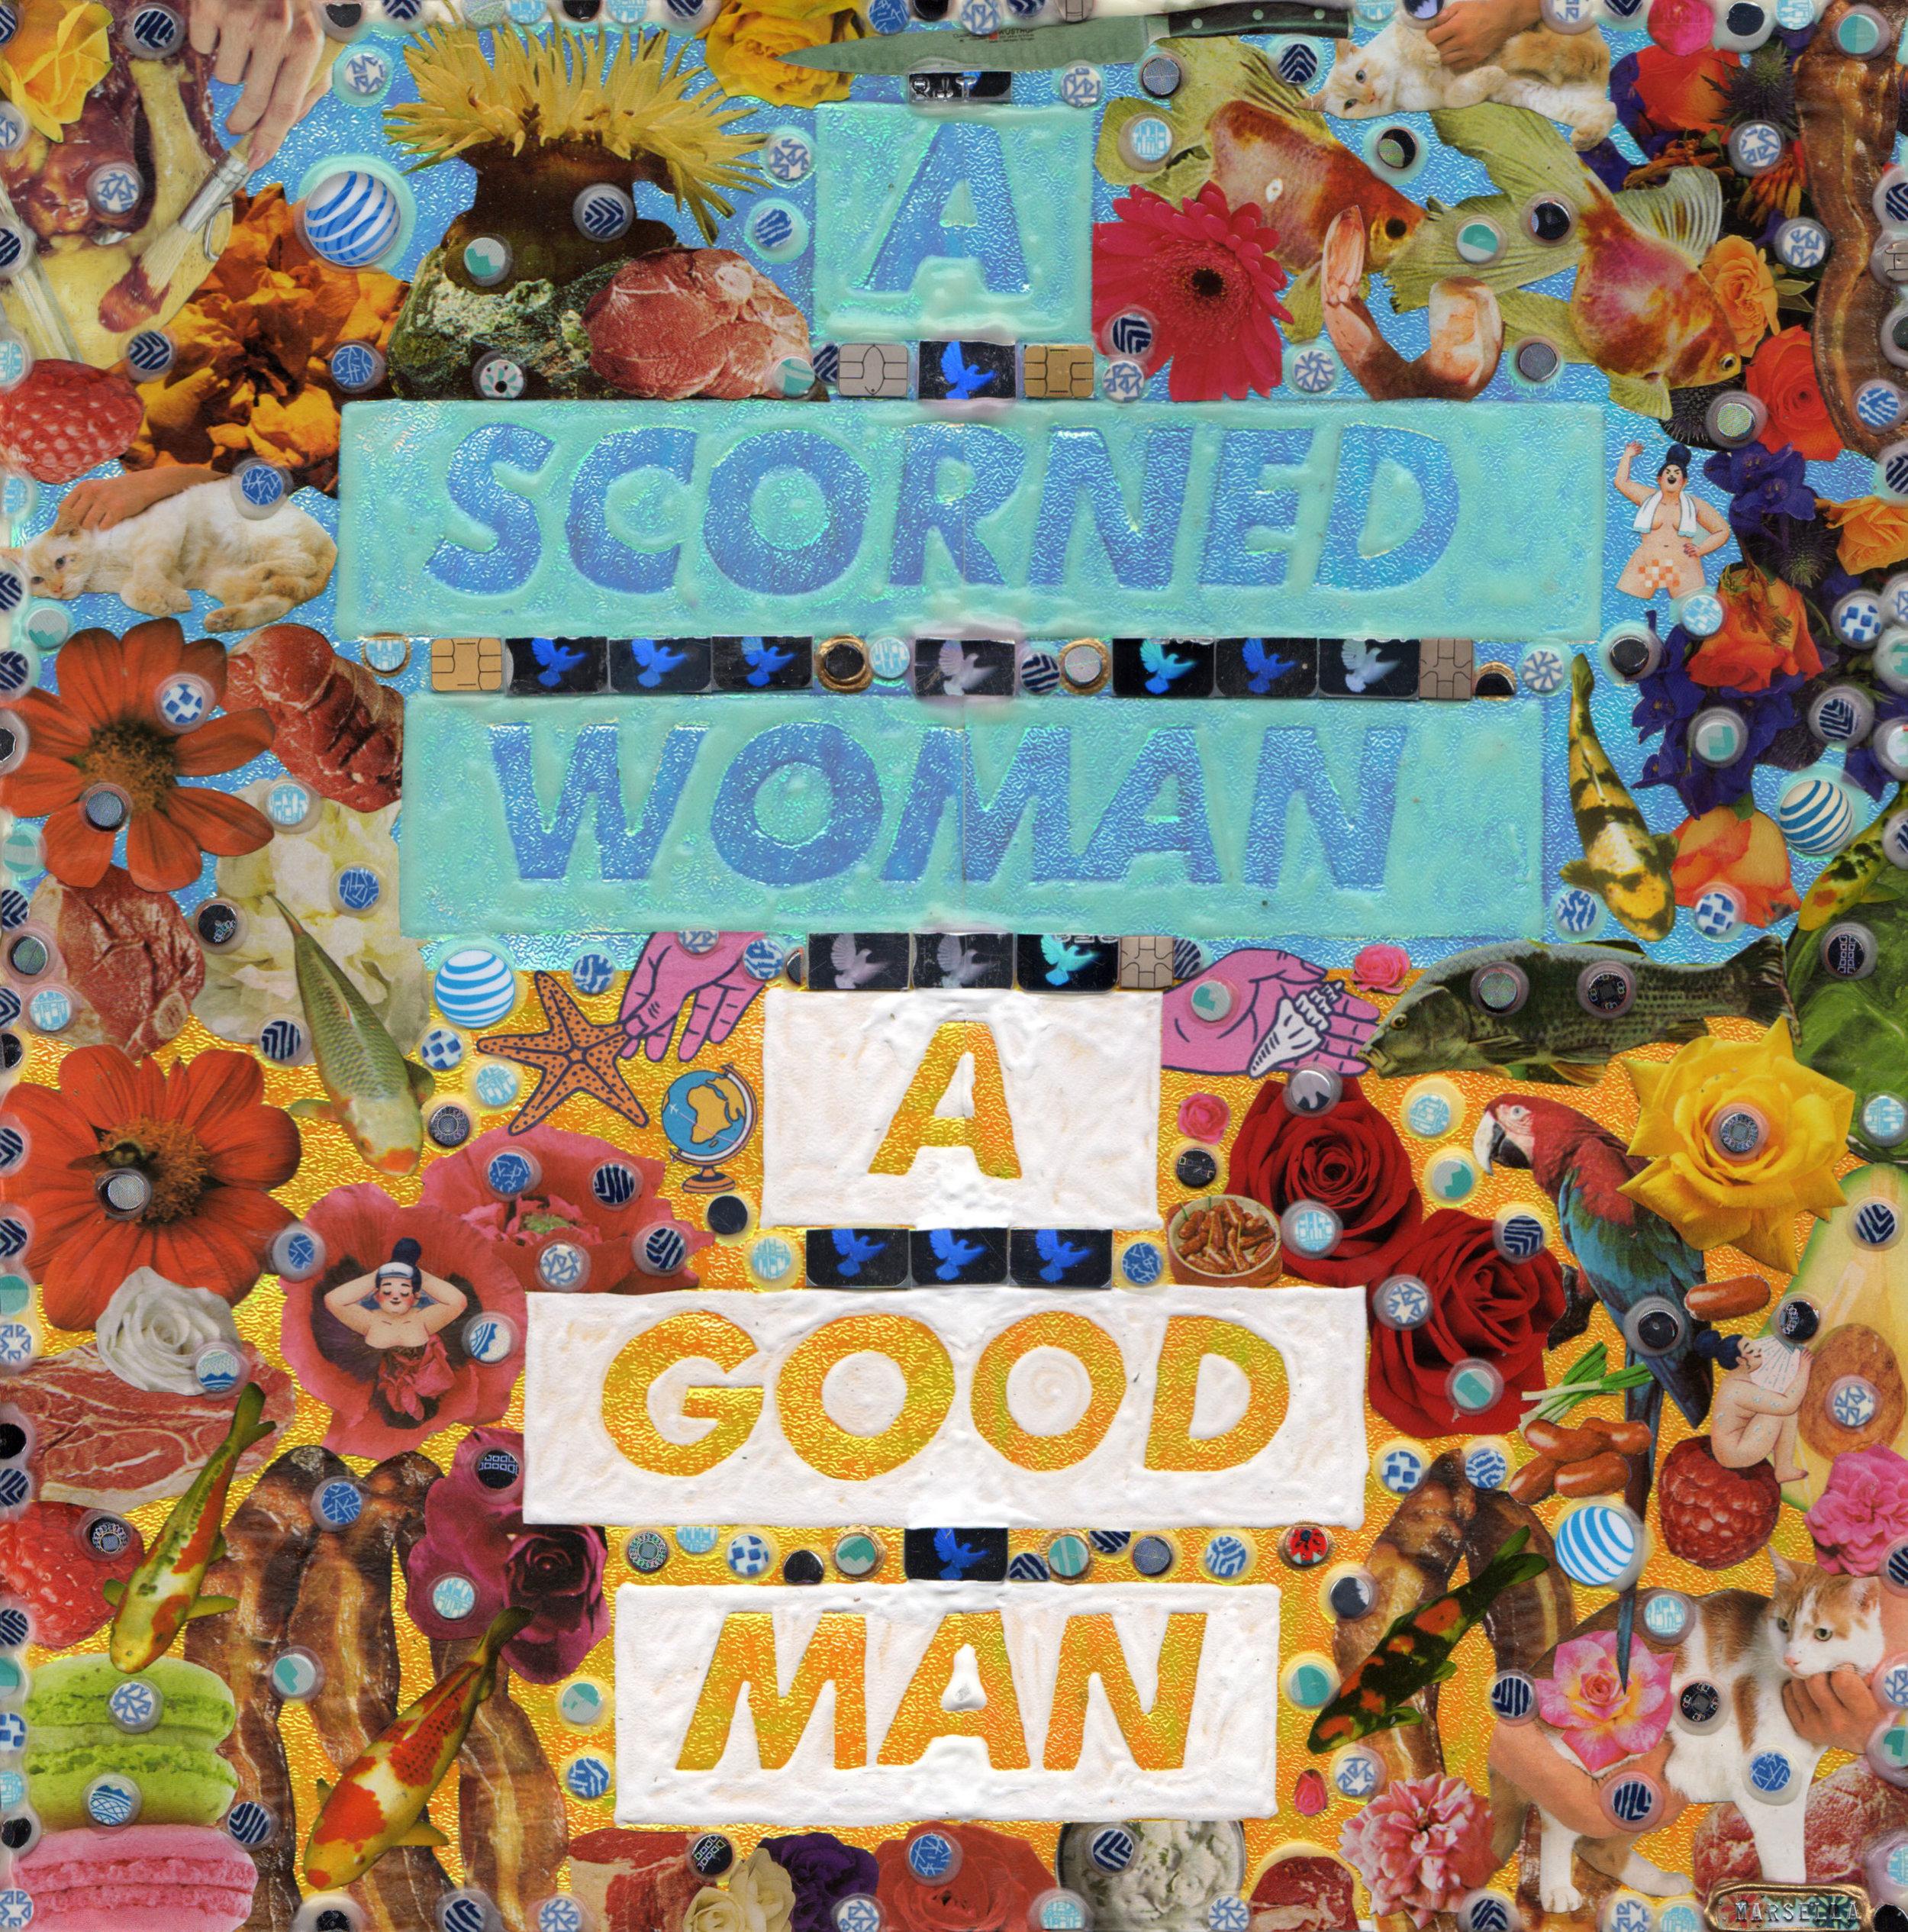 A SCORNED WOMAN A GOOD MAN